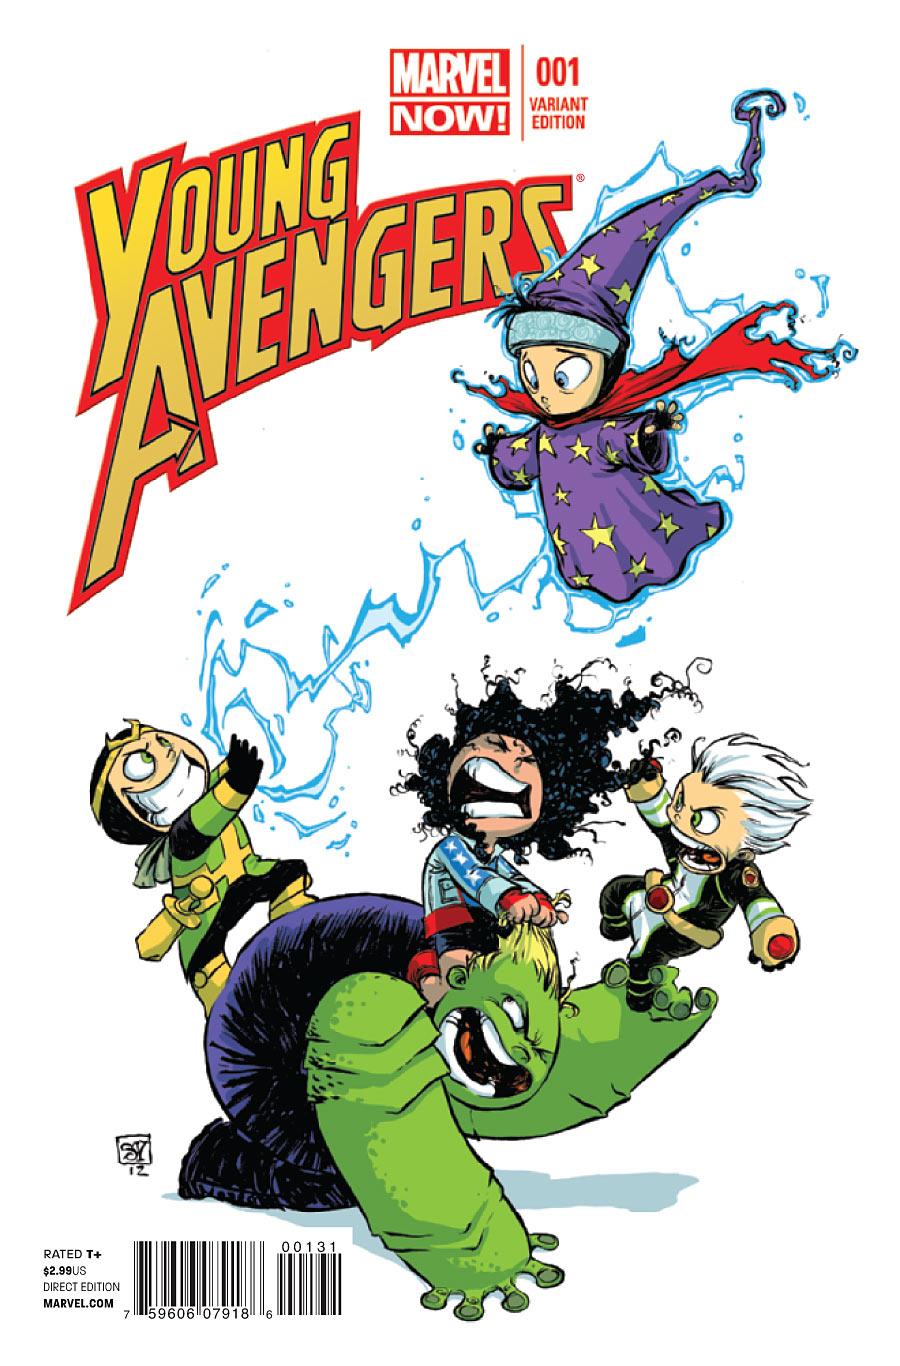 Young Avengers Vol 2 1 - Marvel Comics Database